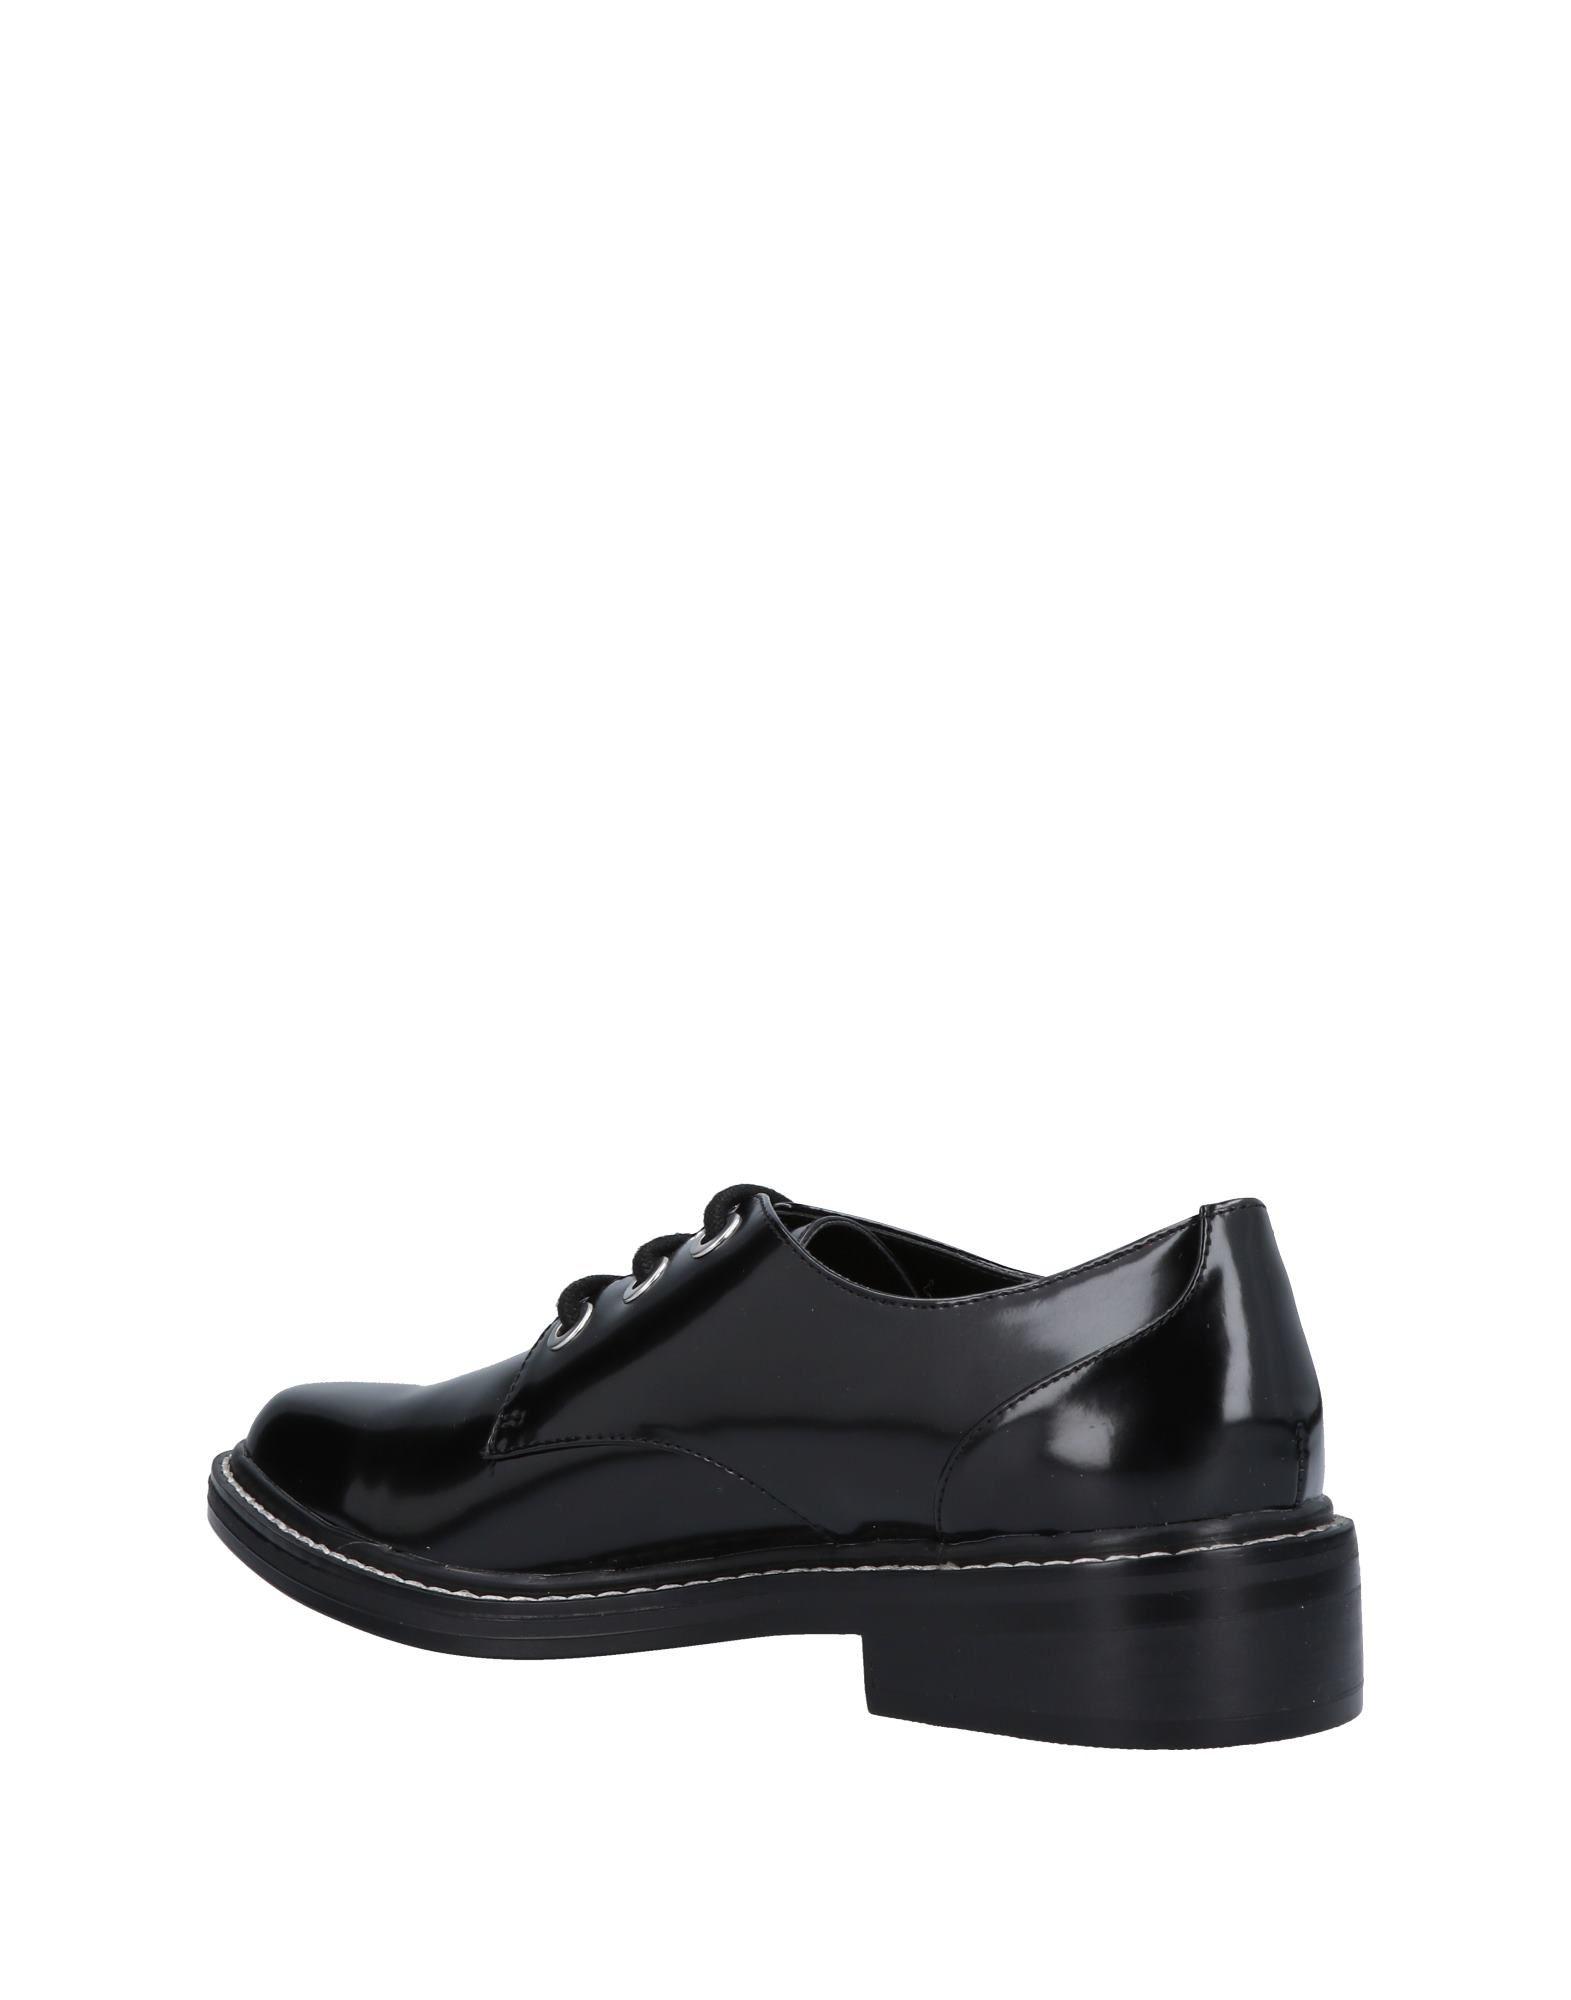 CHAUSSURES - Chaussures à lacetsSteve Madden xxmg0hHezd